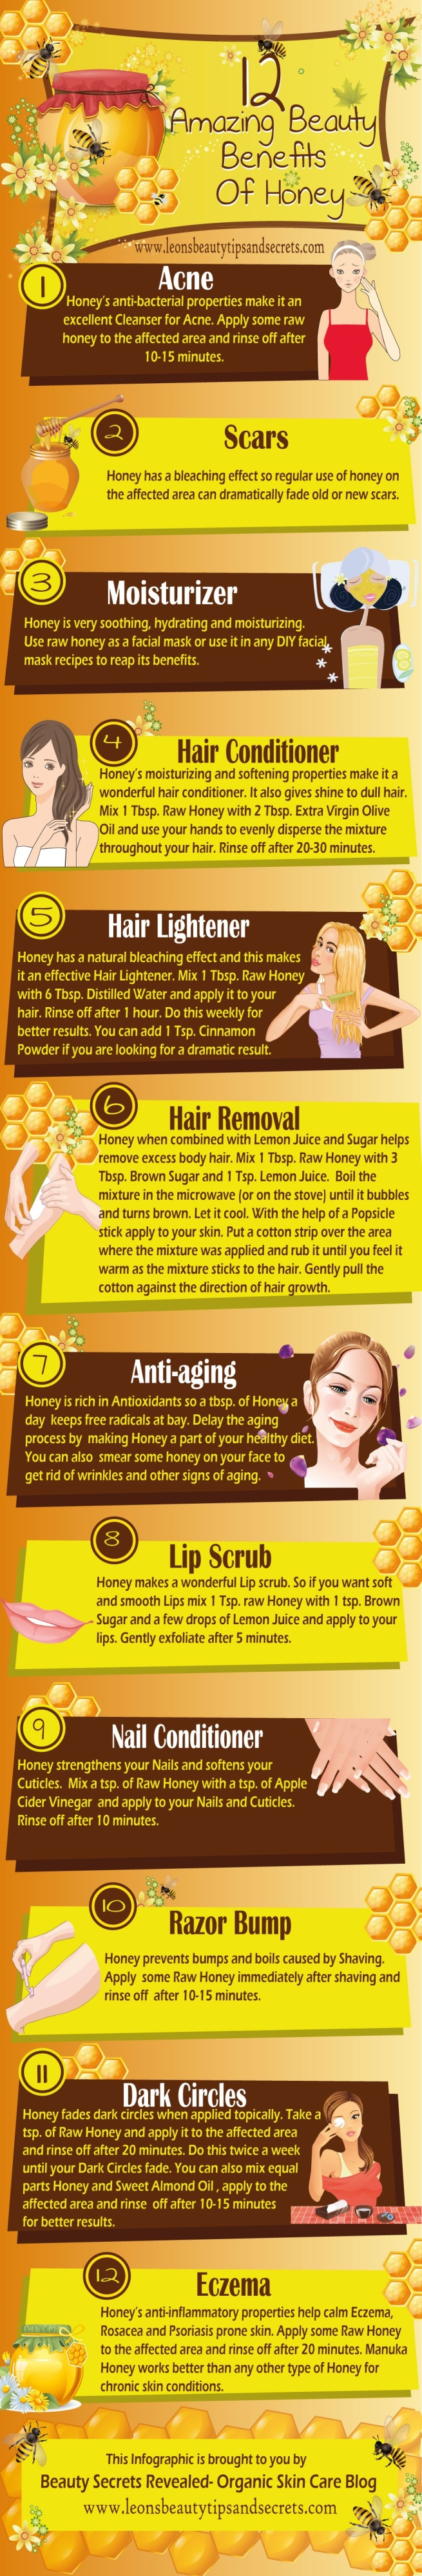 Benefits of Honey on Skin